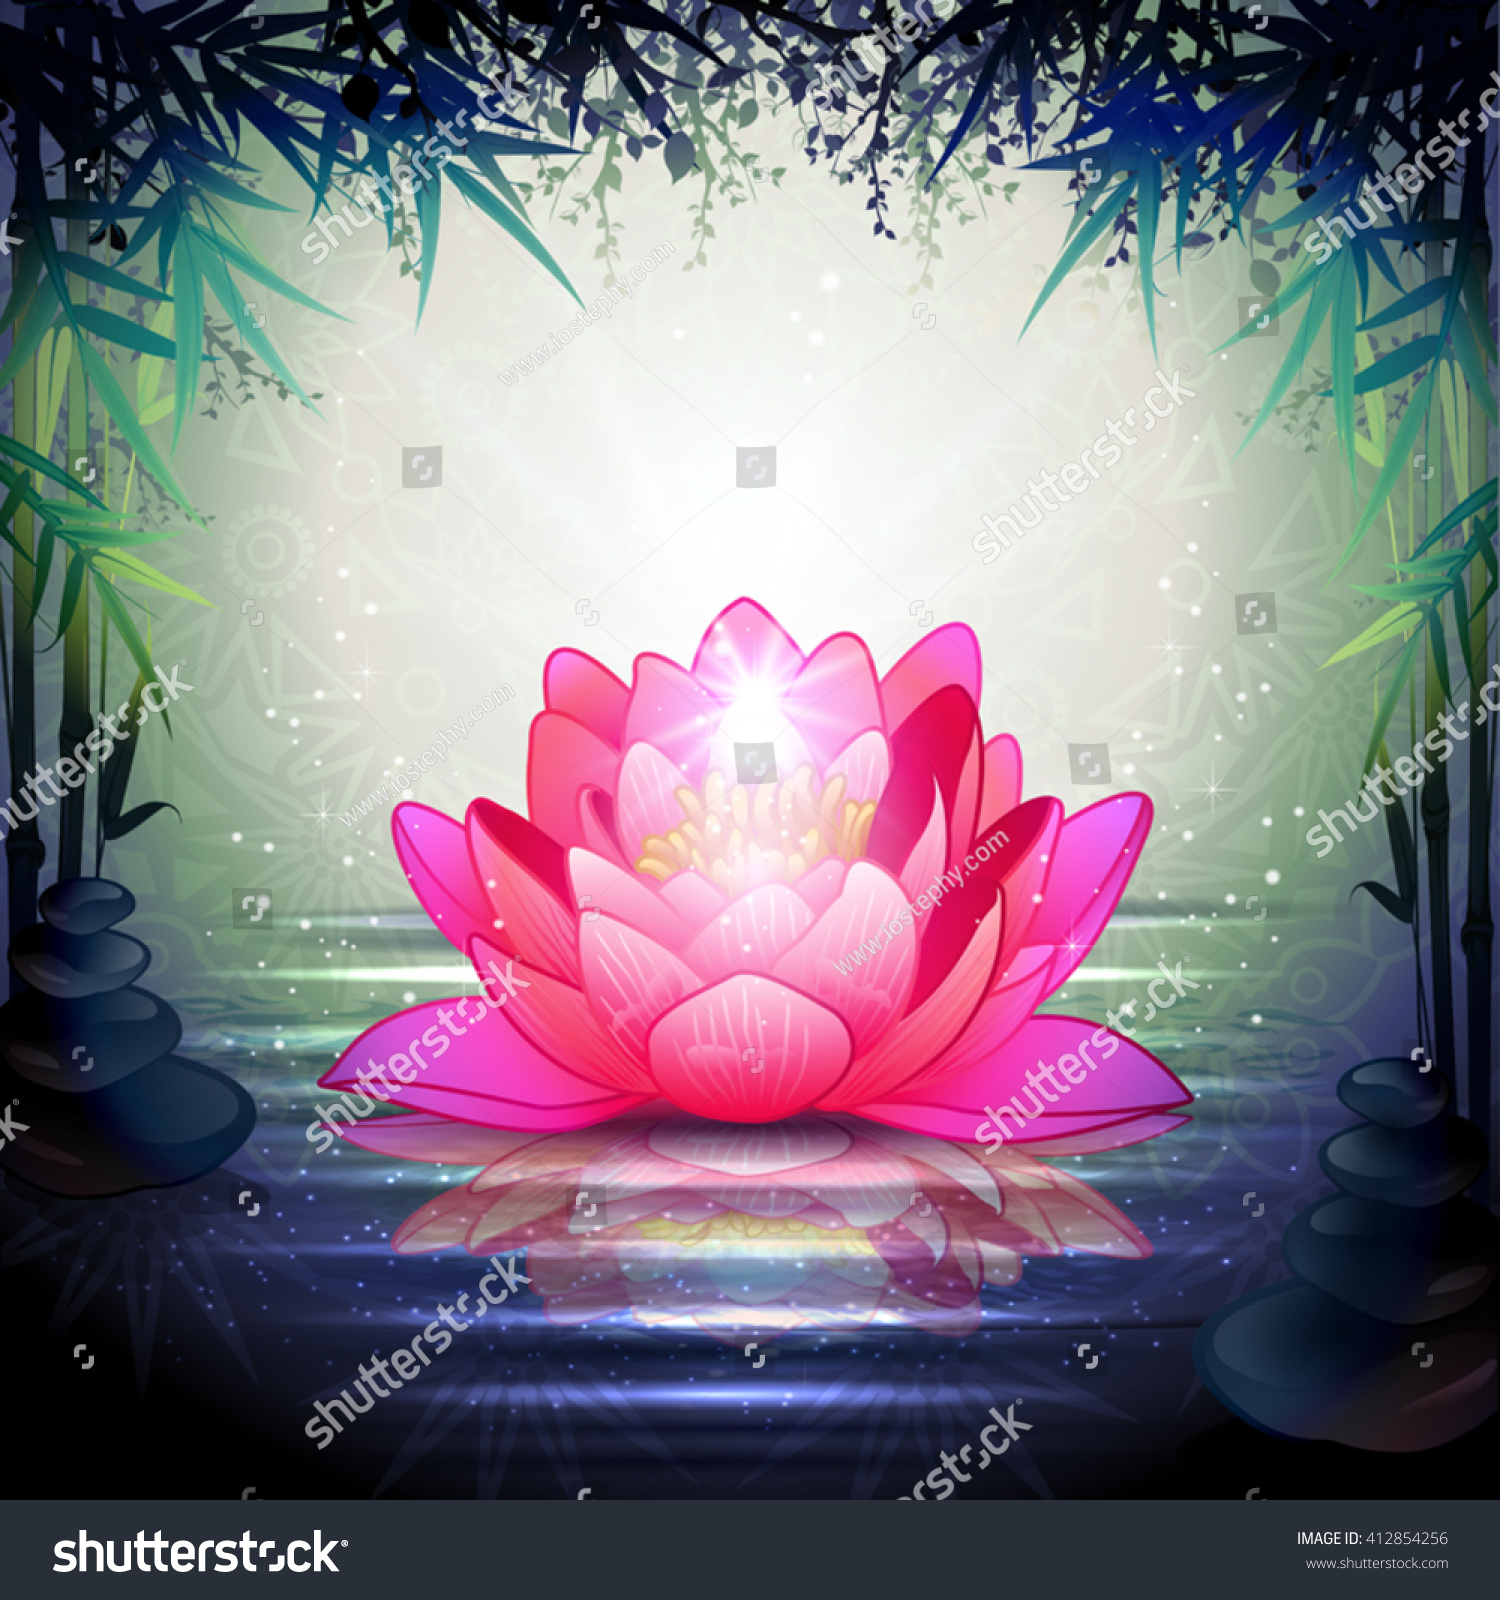 Lotus Flower Tranquil Zen Garden Transparency Blending Stock Vector